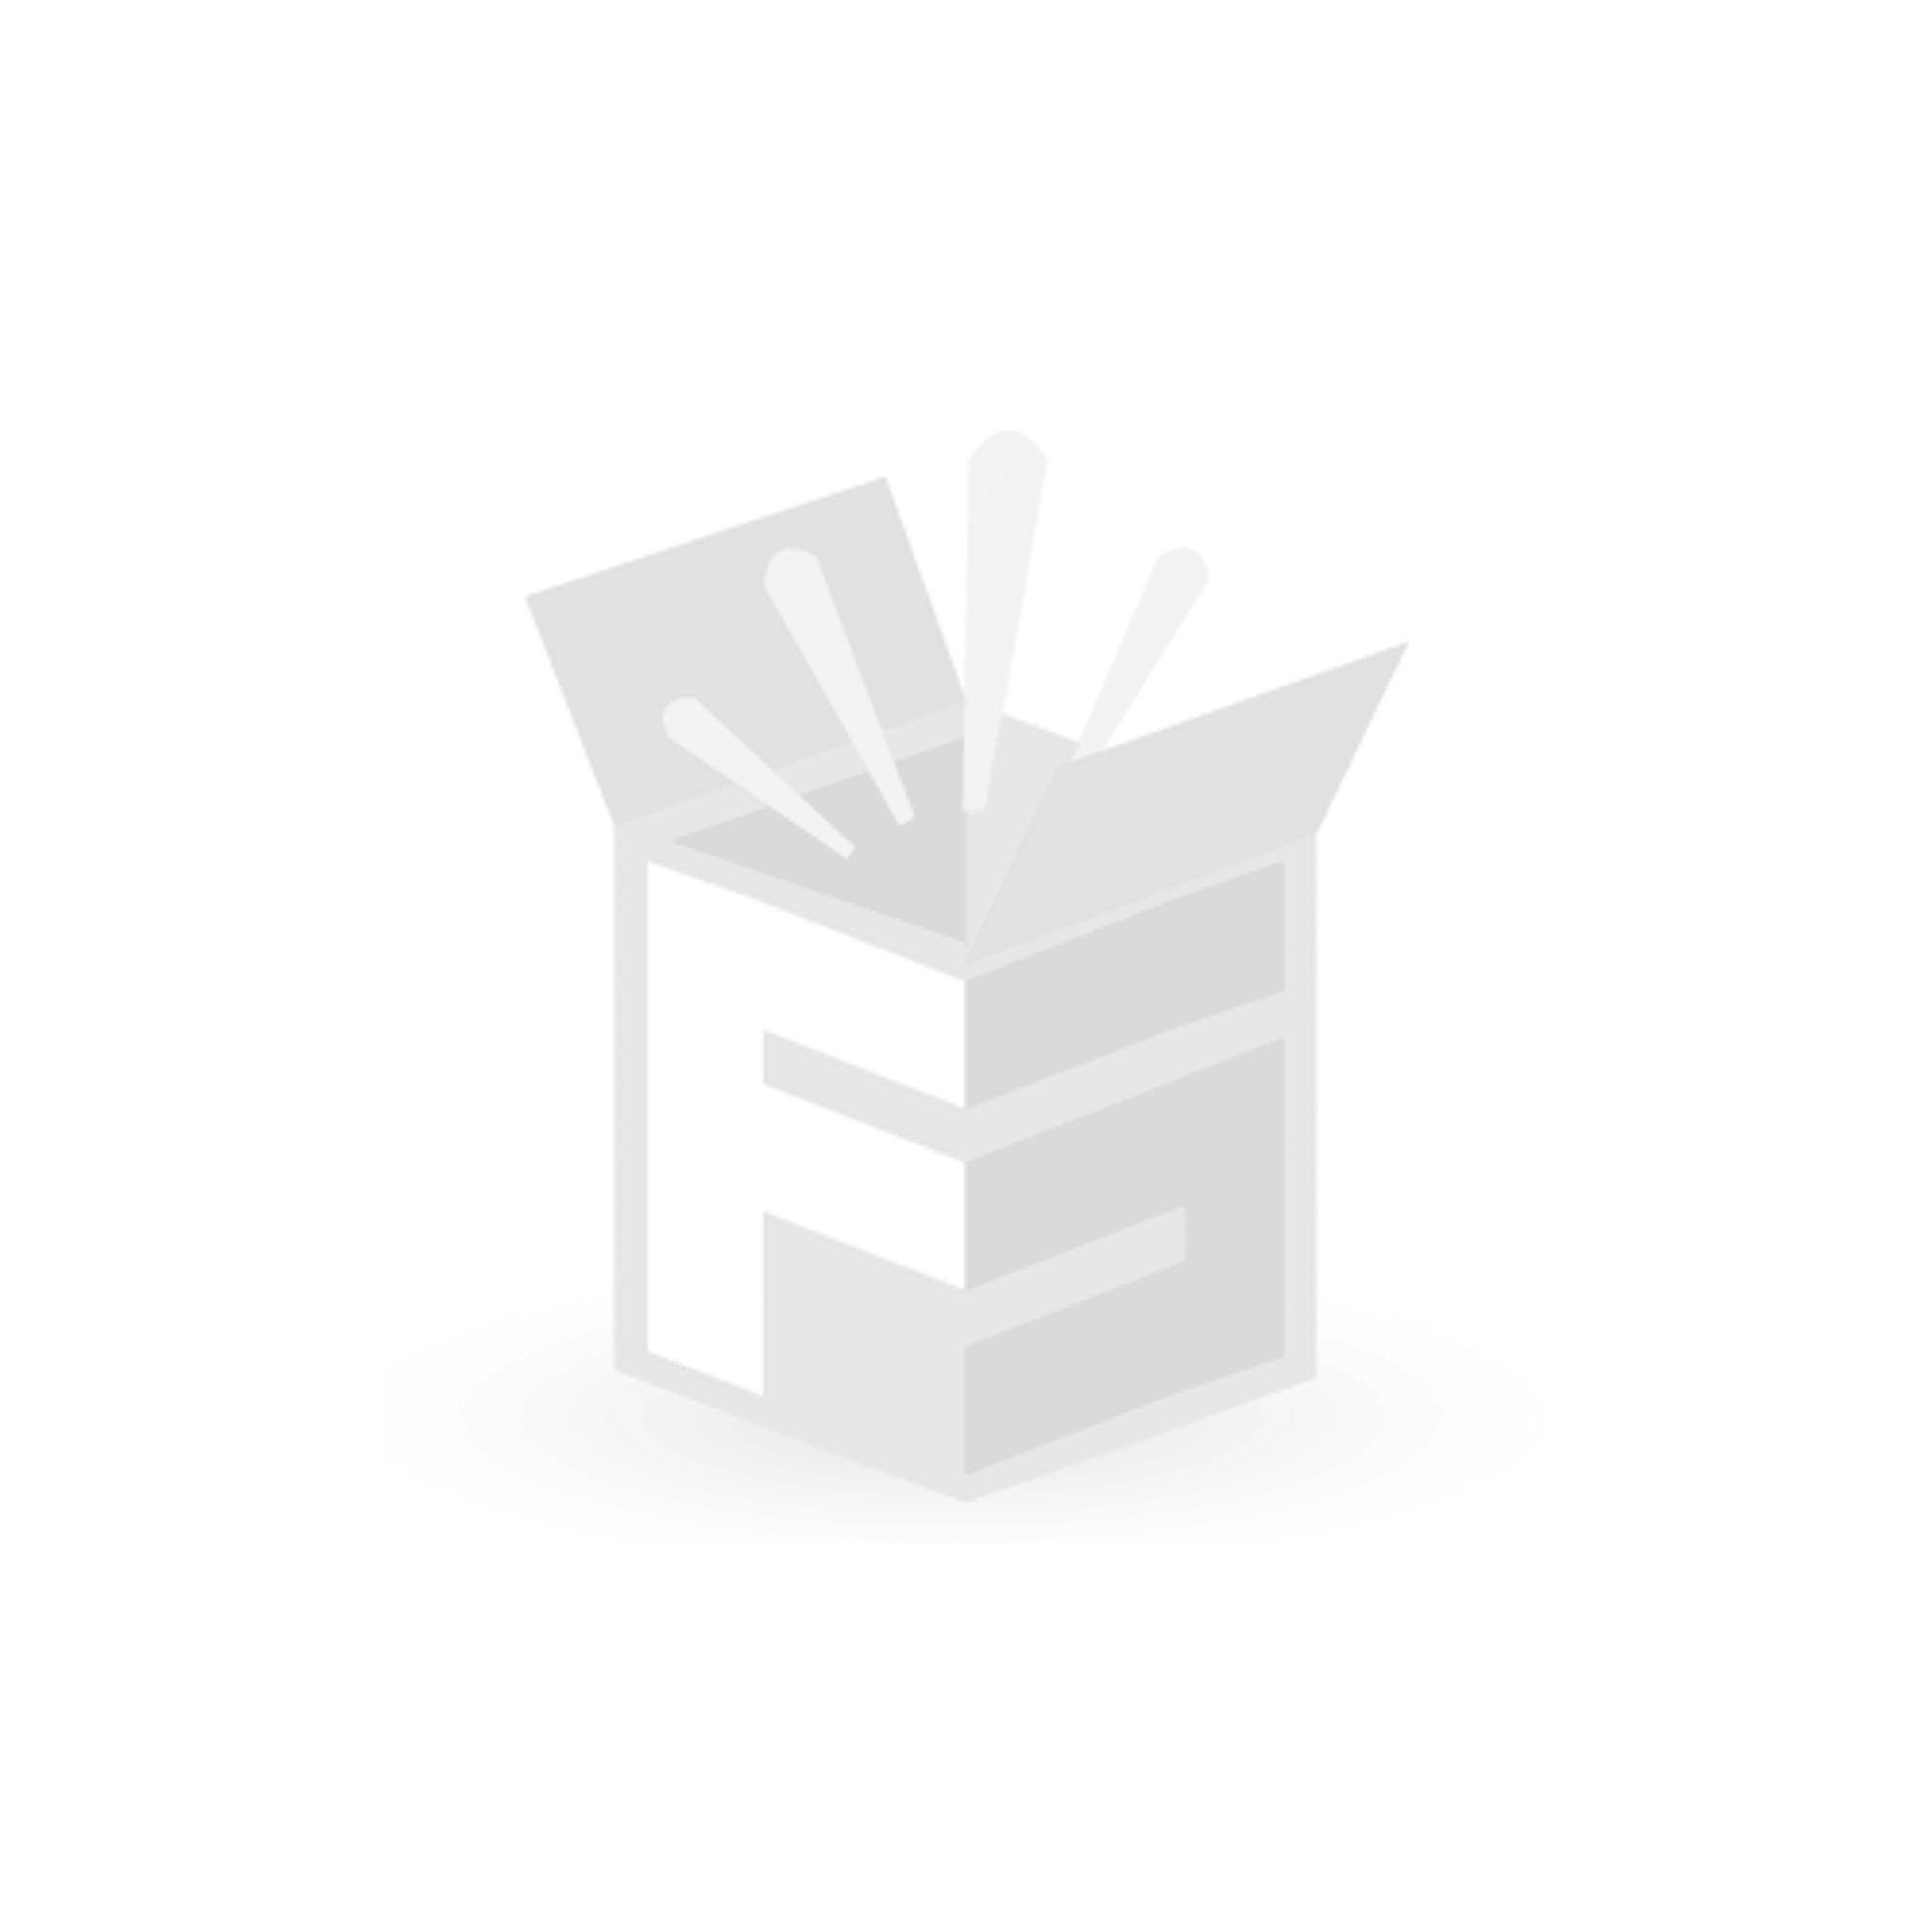 Contini höhenverstellbarer Bürotisch 180 x 80 cm, grau / Gestell dunkelgrau